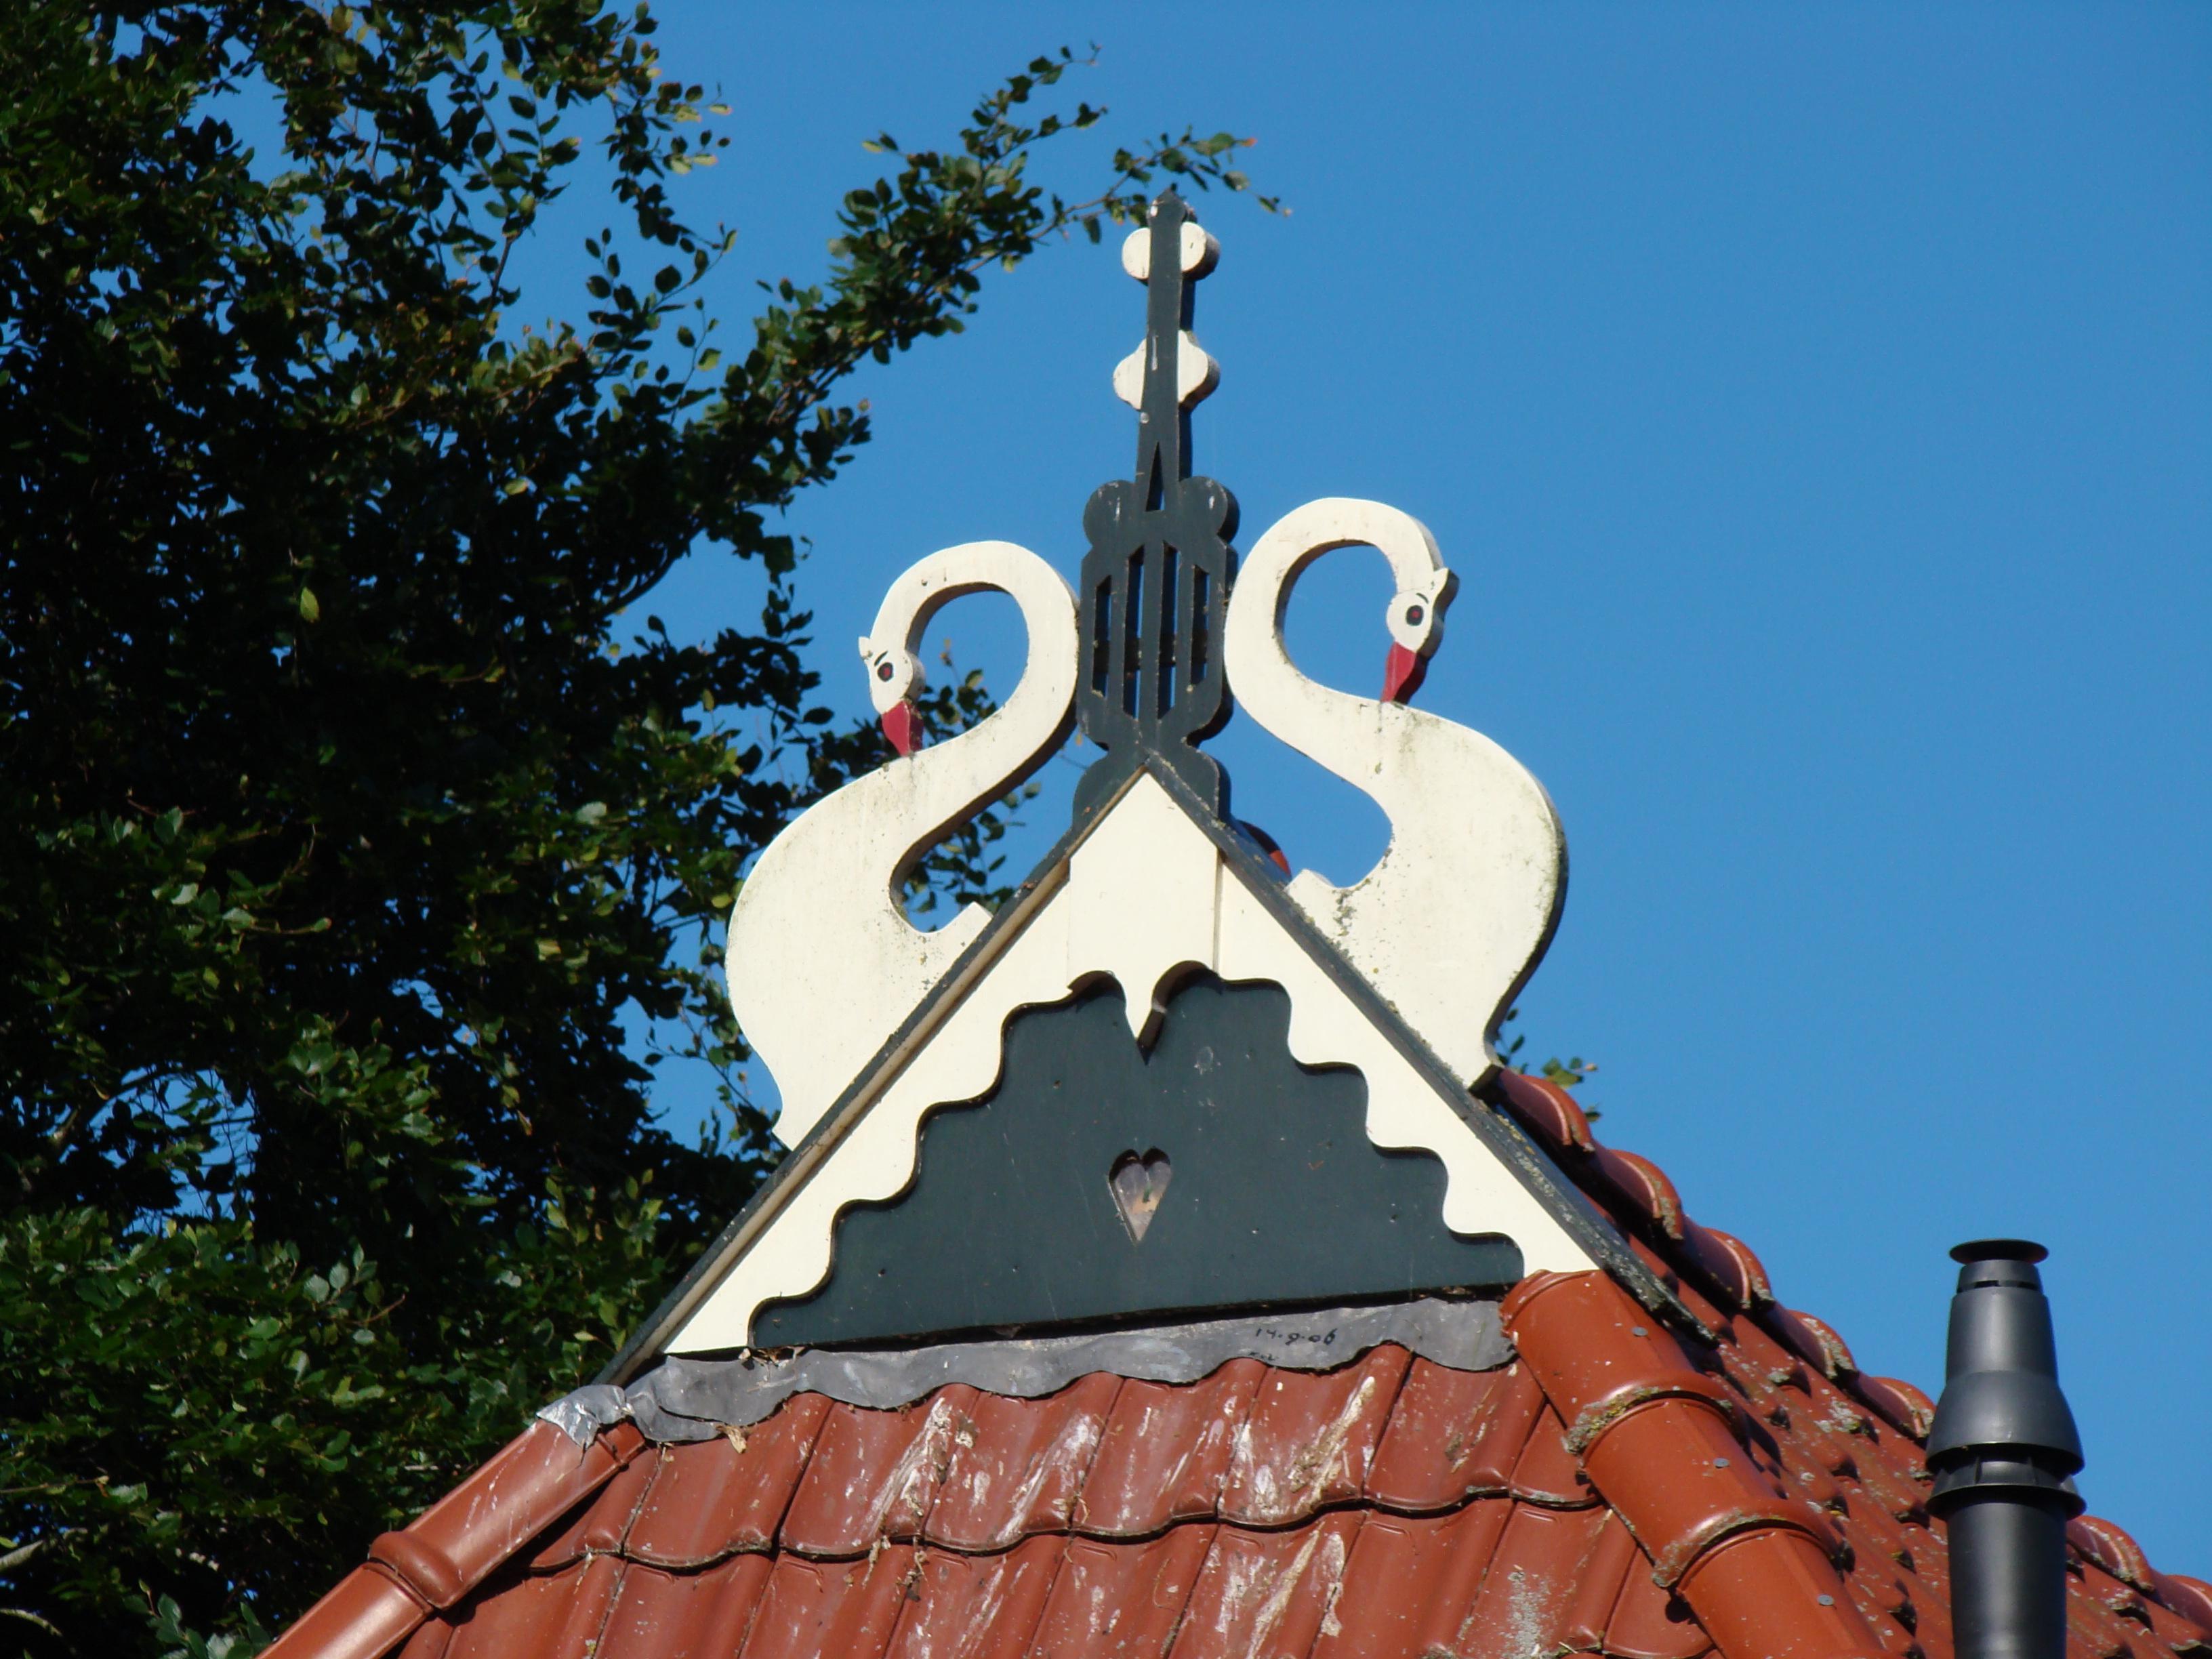 https://upload.wikimedia.org/wikipedia/commons/9/95/Sloten_Friesland_imp_013.JPG